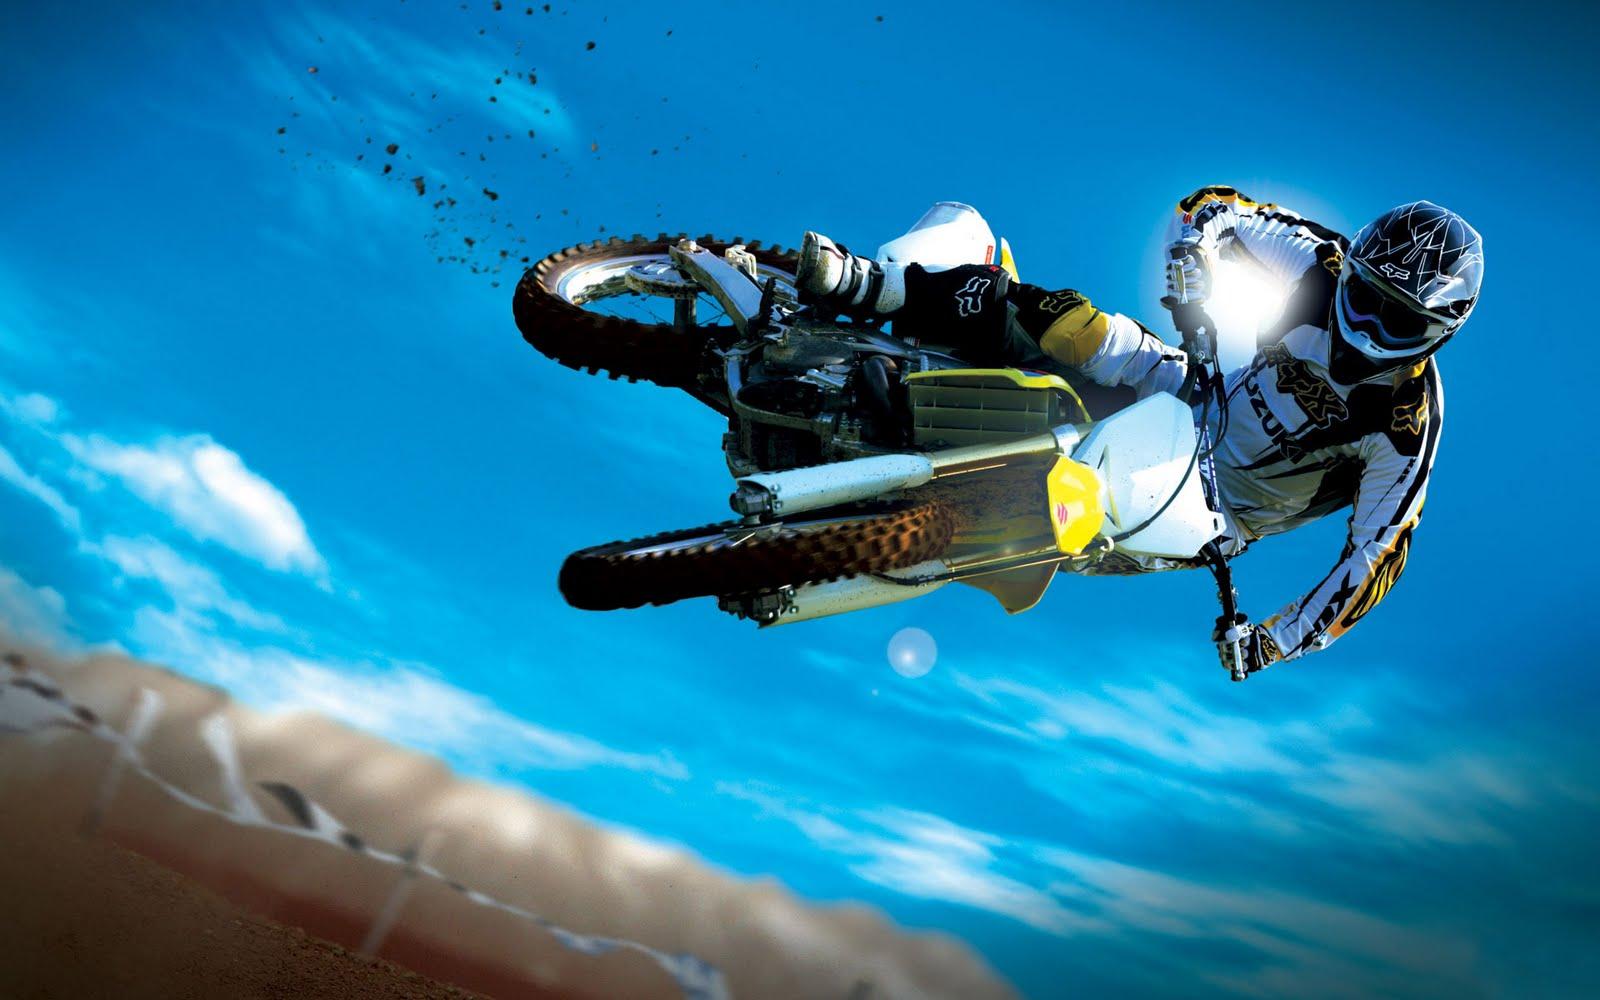 http://4.bp.blogspot.com/-QZIanOj5ViI/TcX_cP21jdI/AAAAAAAAAVU/-Yik9wOP4i8/s1600/motocross-bike-wallpapers.jpg